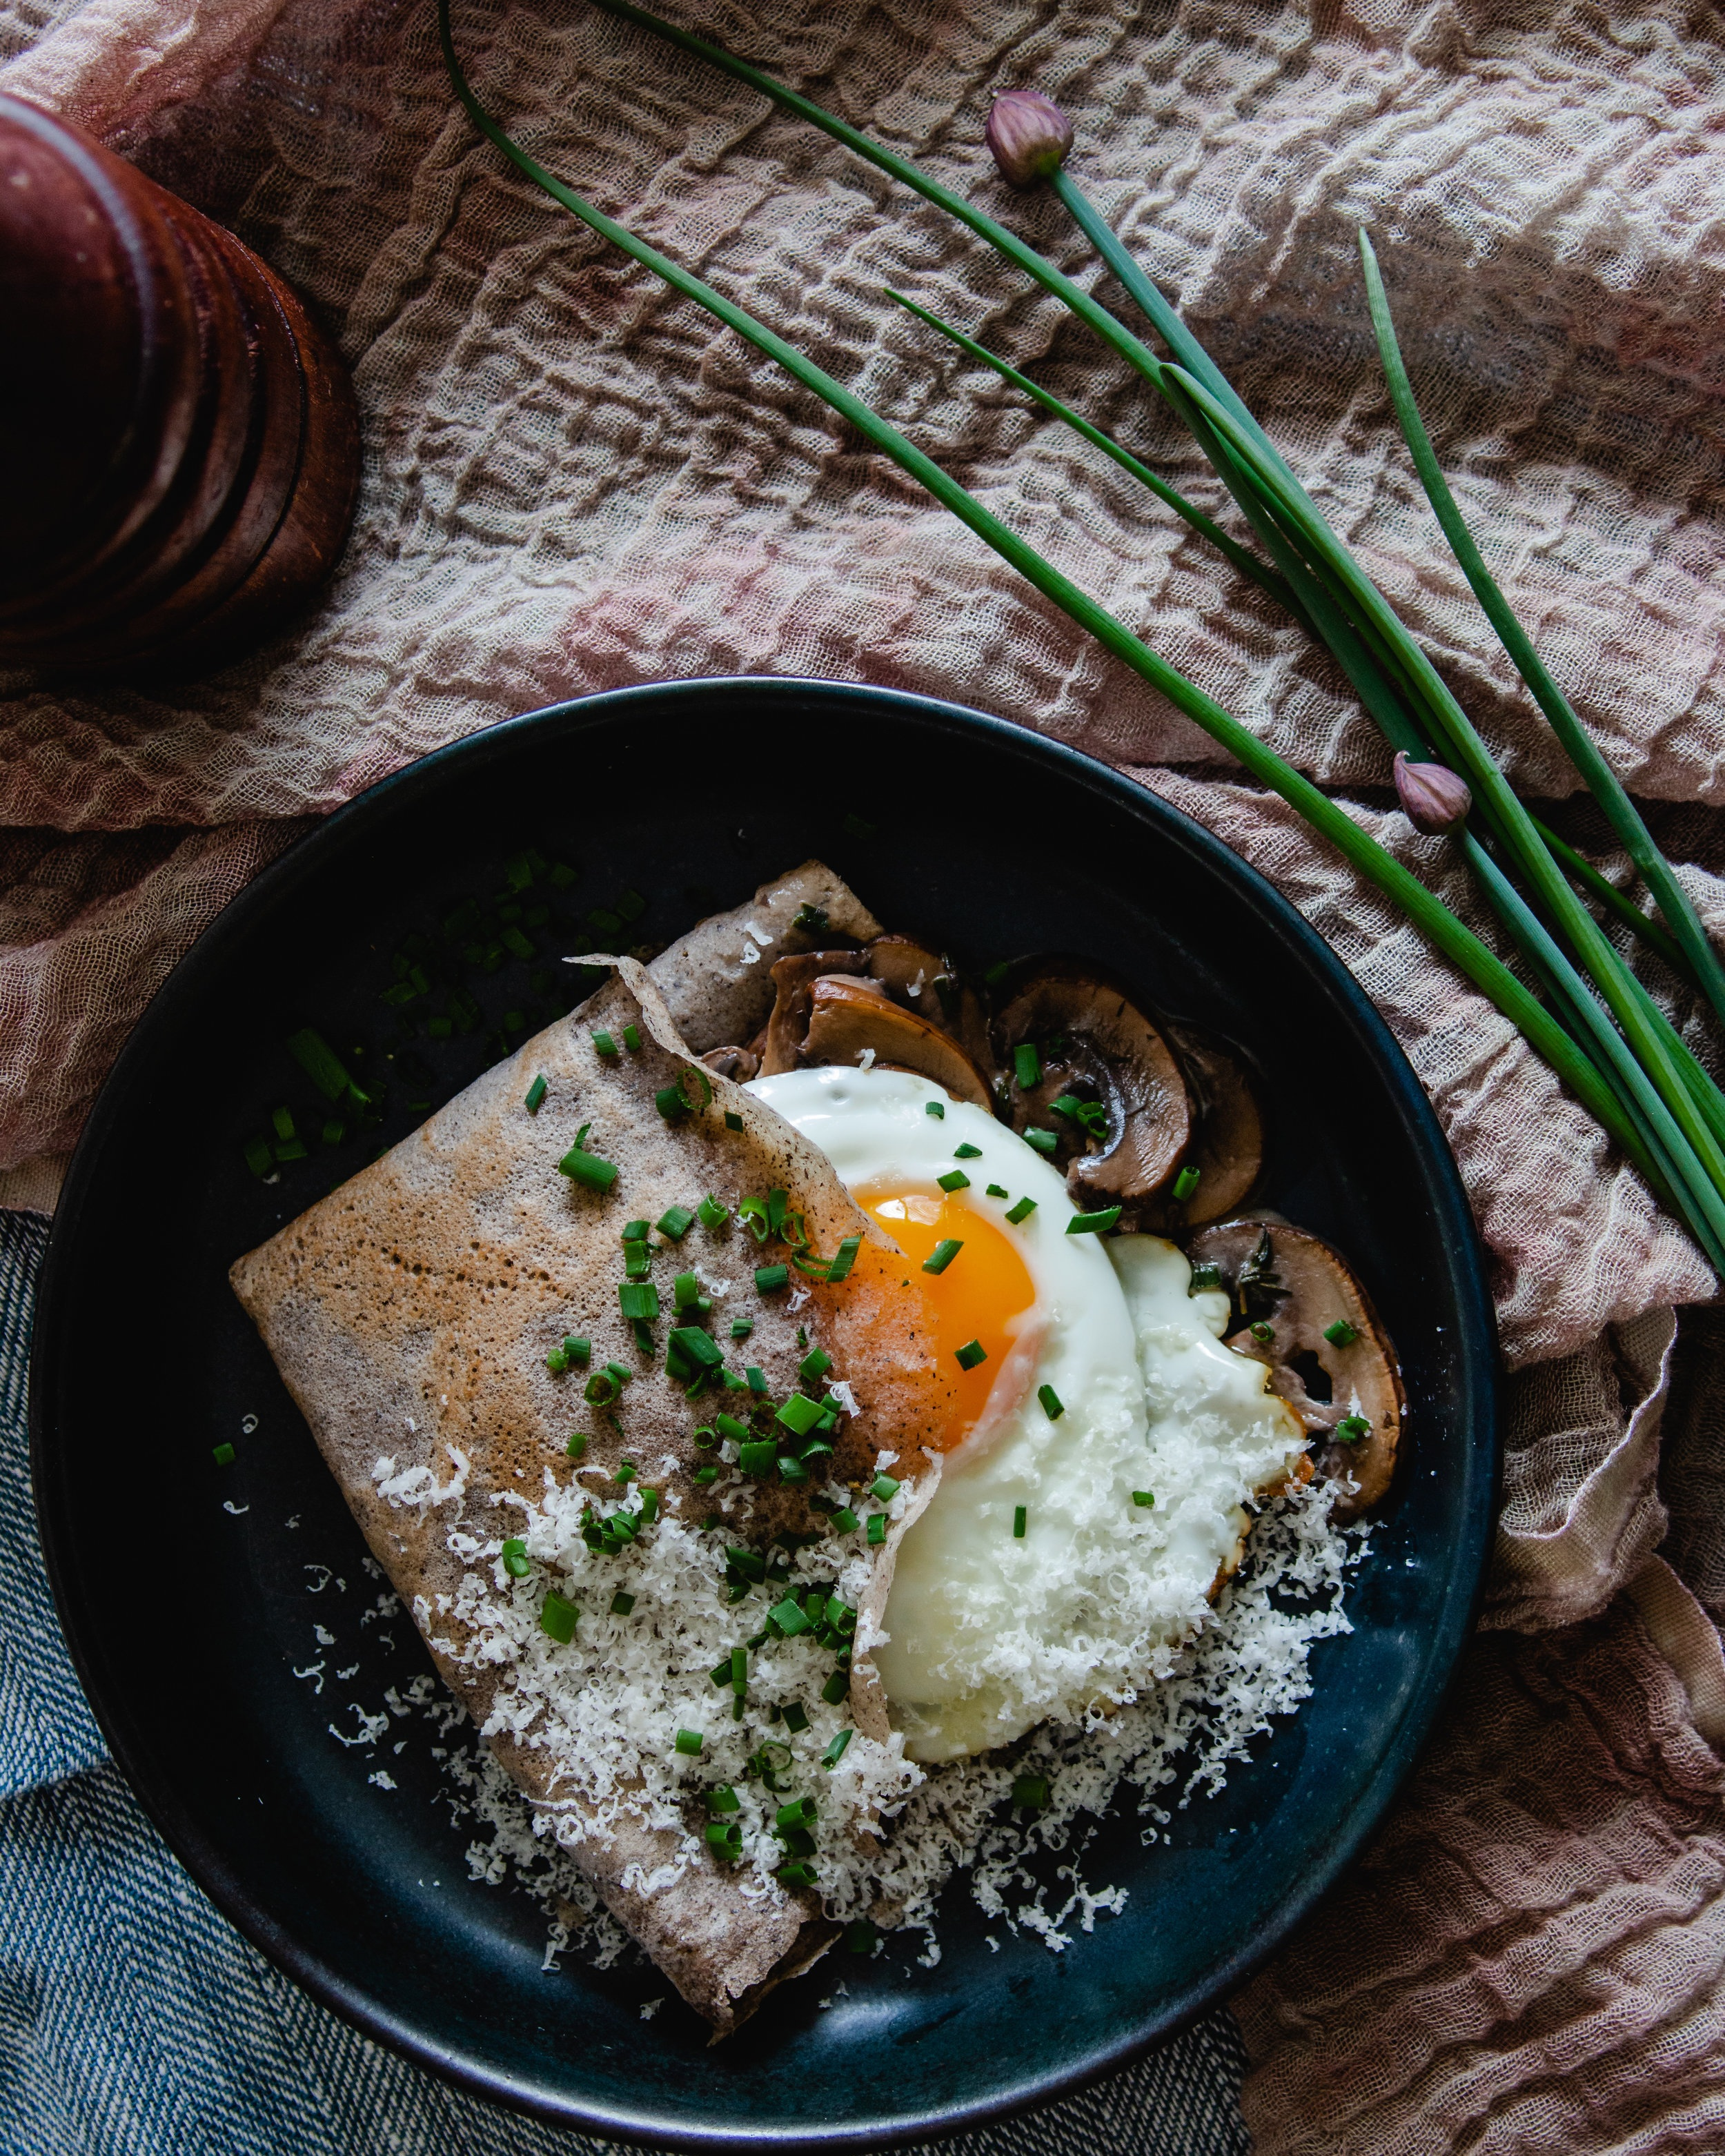 Savoury Buckwheat Crepes